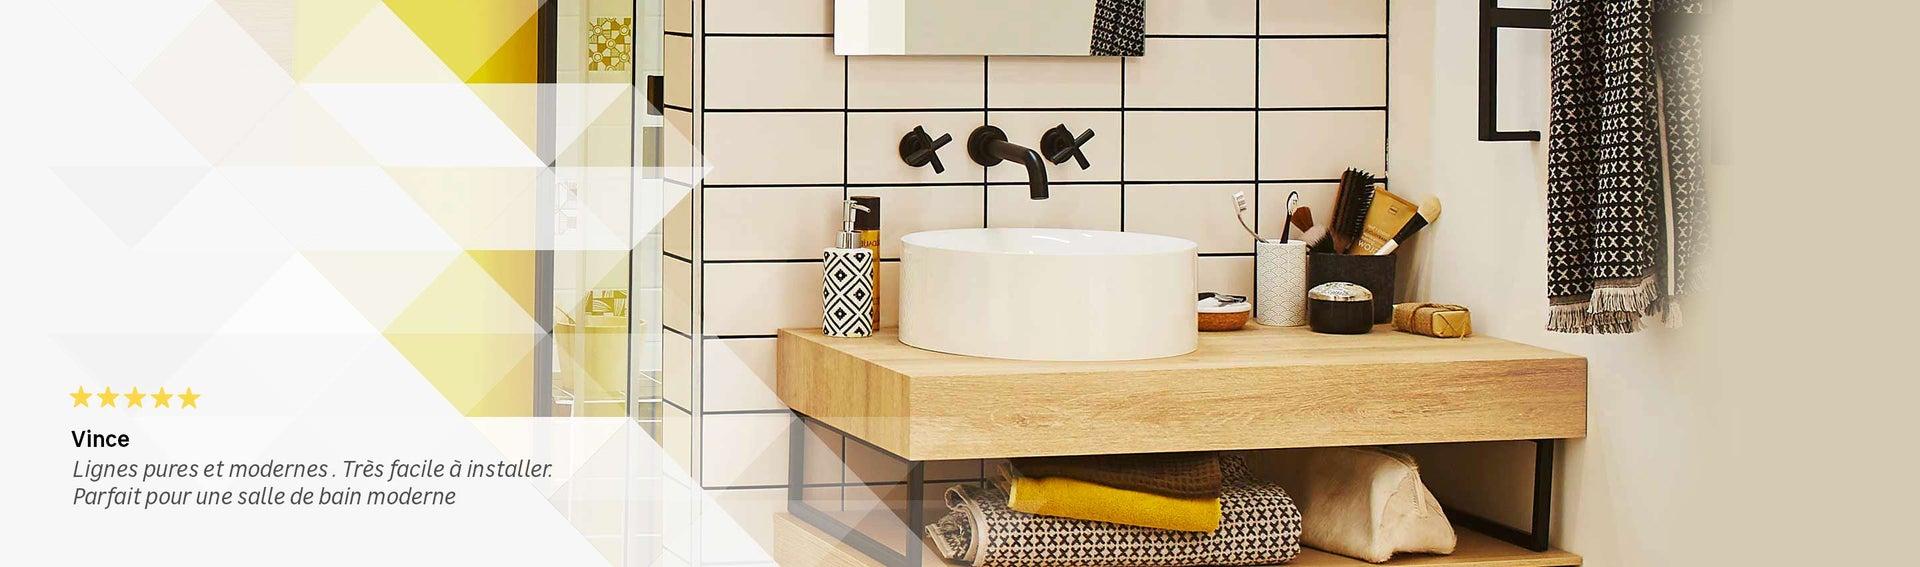 Salle de bain & sanitaire | Leroy Merlin